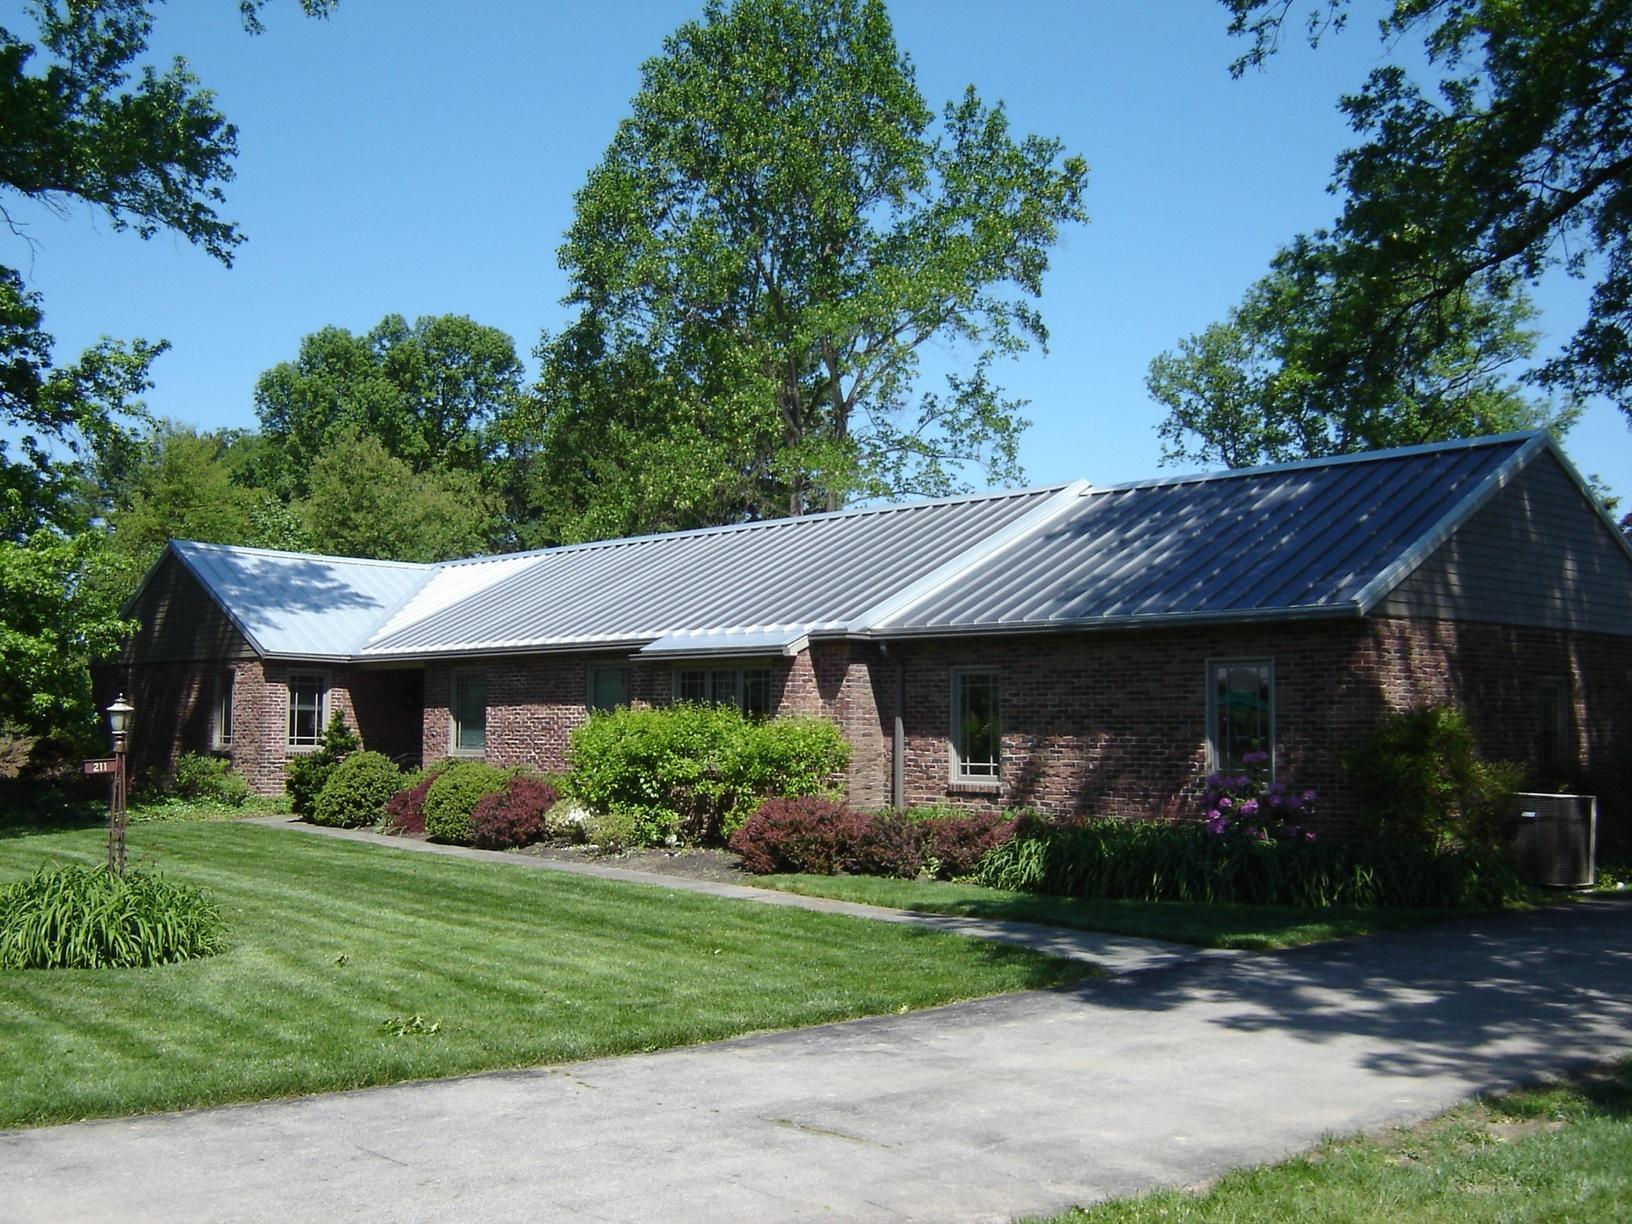 Bayville, NJ Solar Thin Film Metal Roof